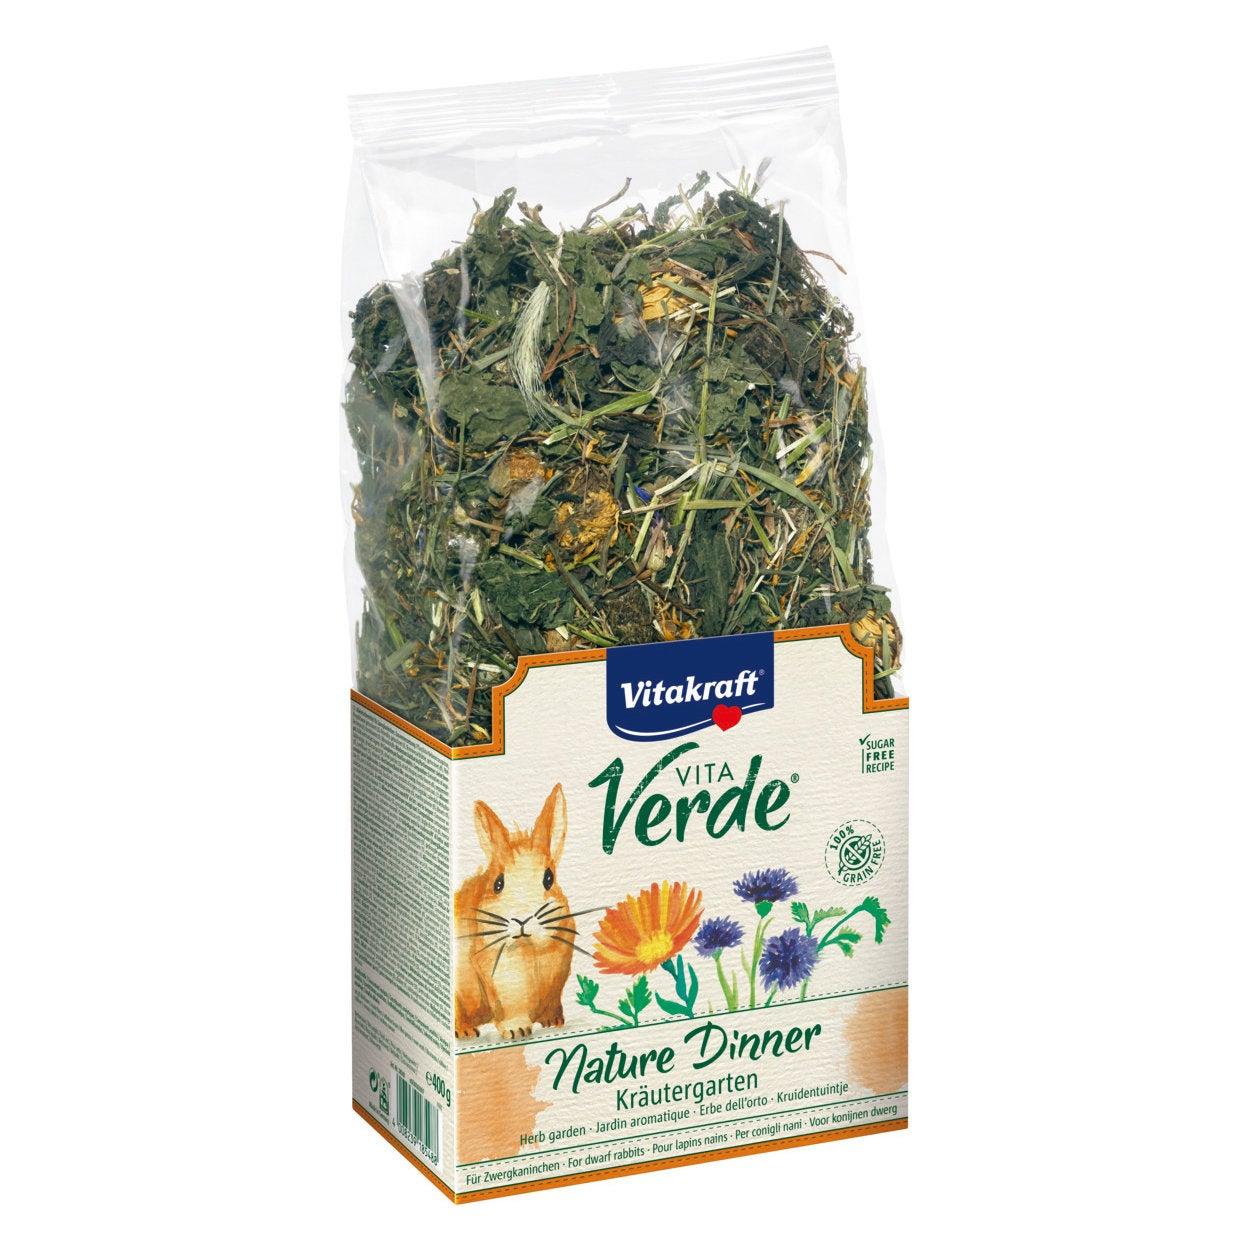 Vitakraft Vita Verde Nature Dinner konijn 400 g